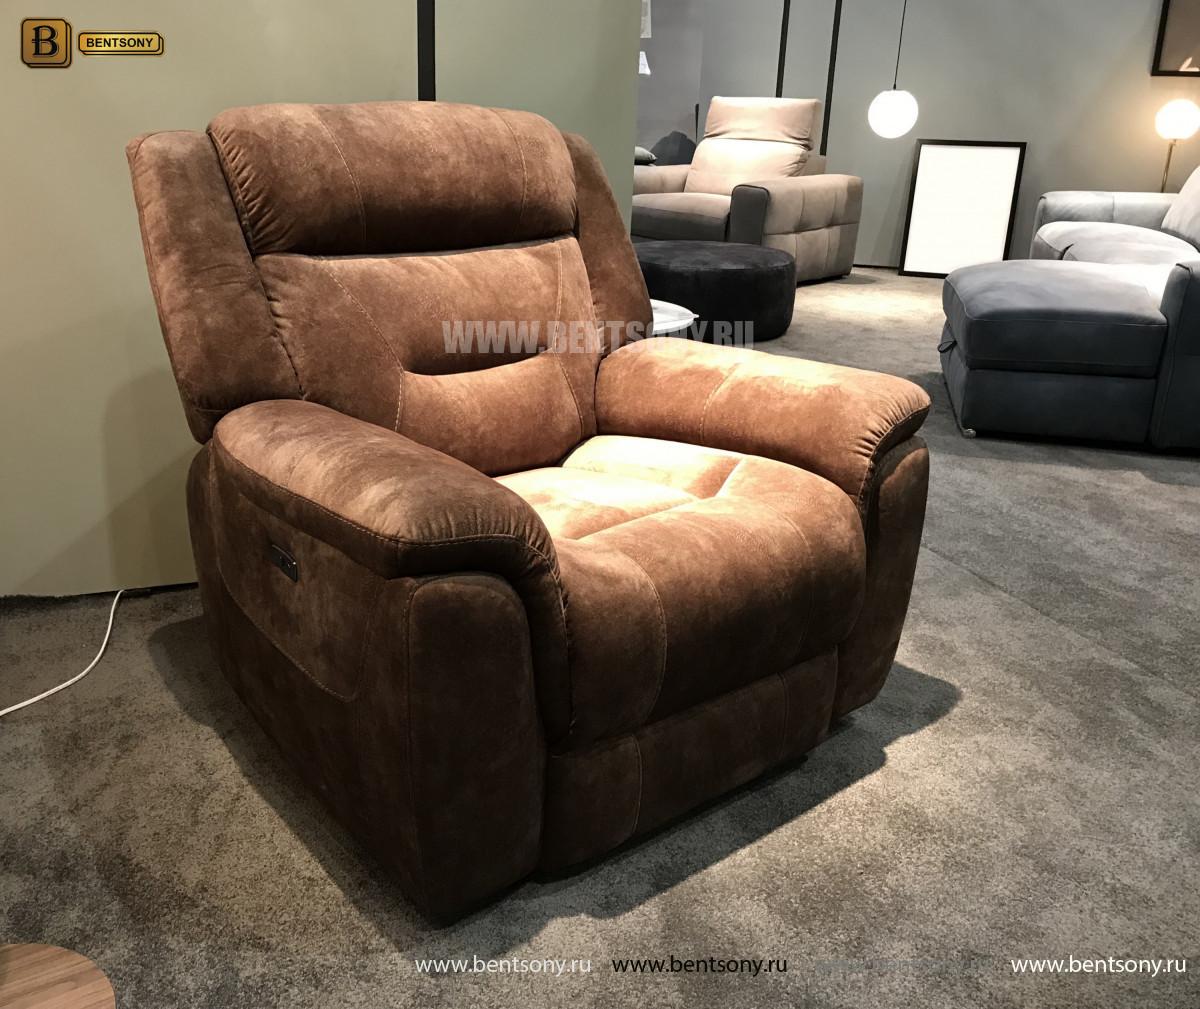 Кресло Бенкото (Реклайнер, Алькантара) для квартиры